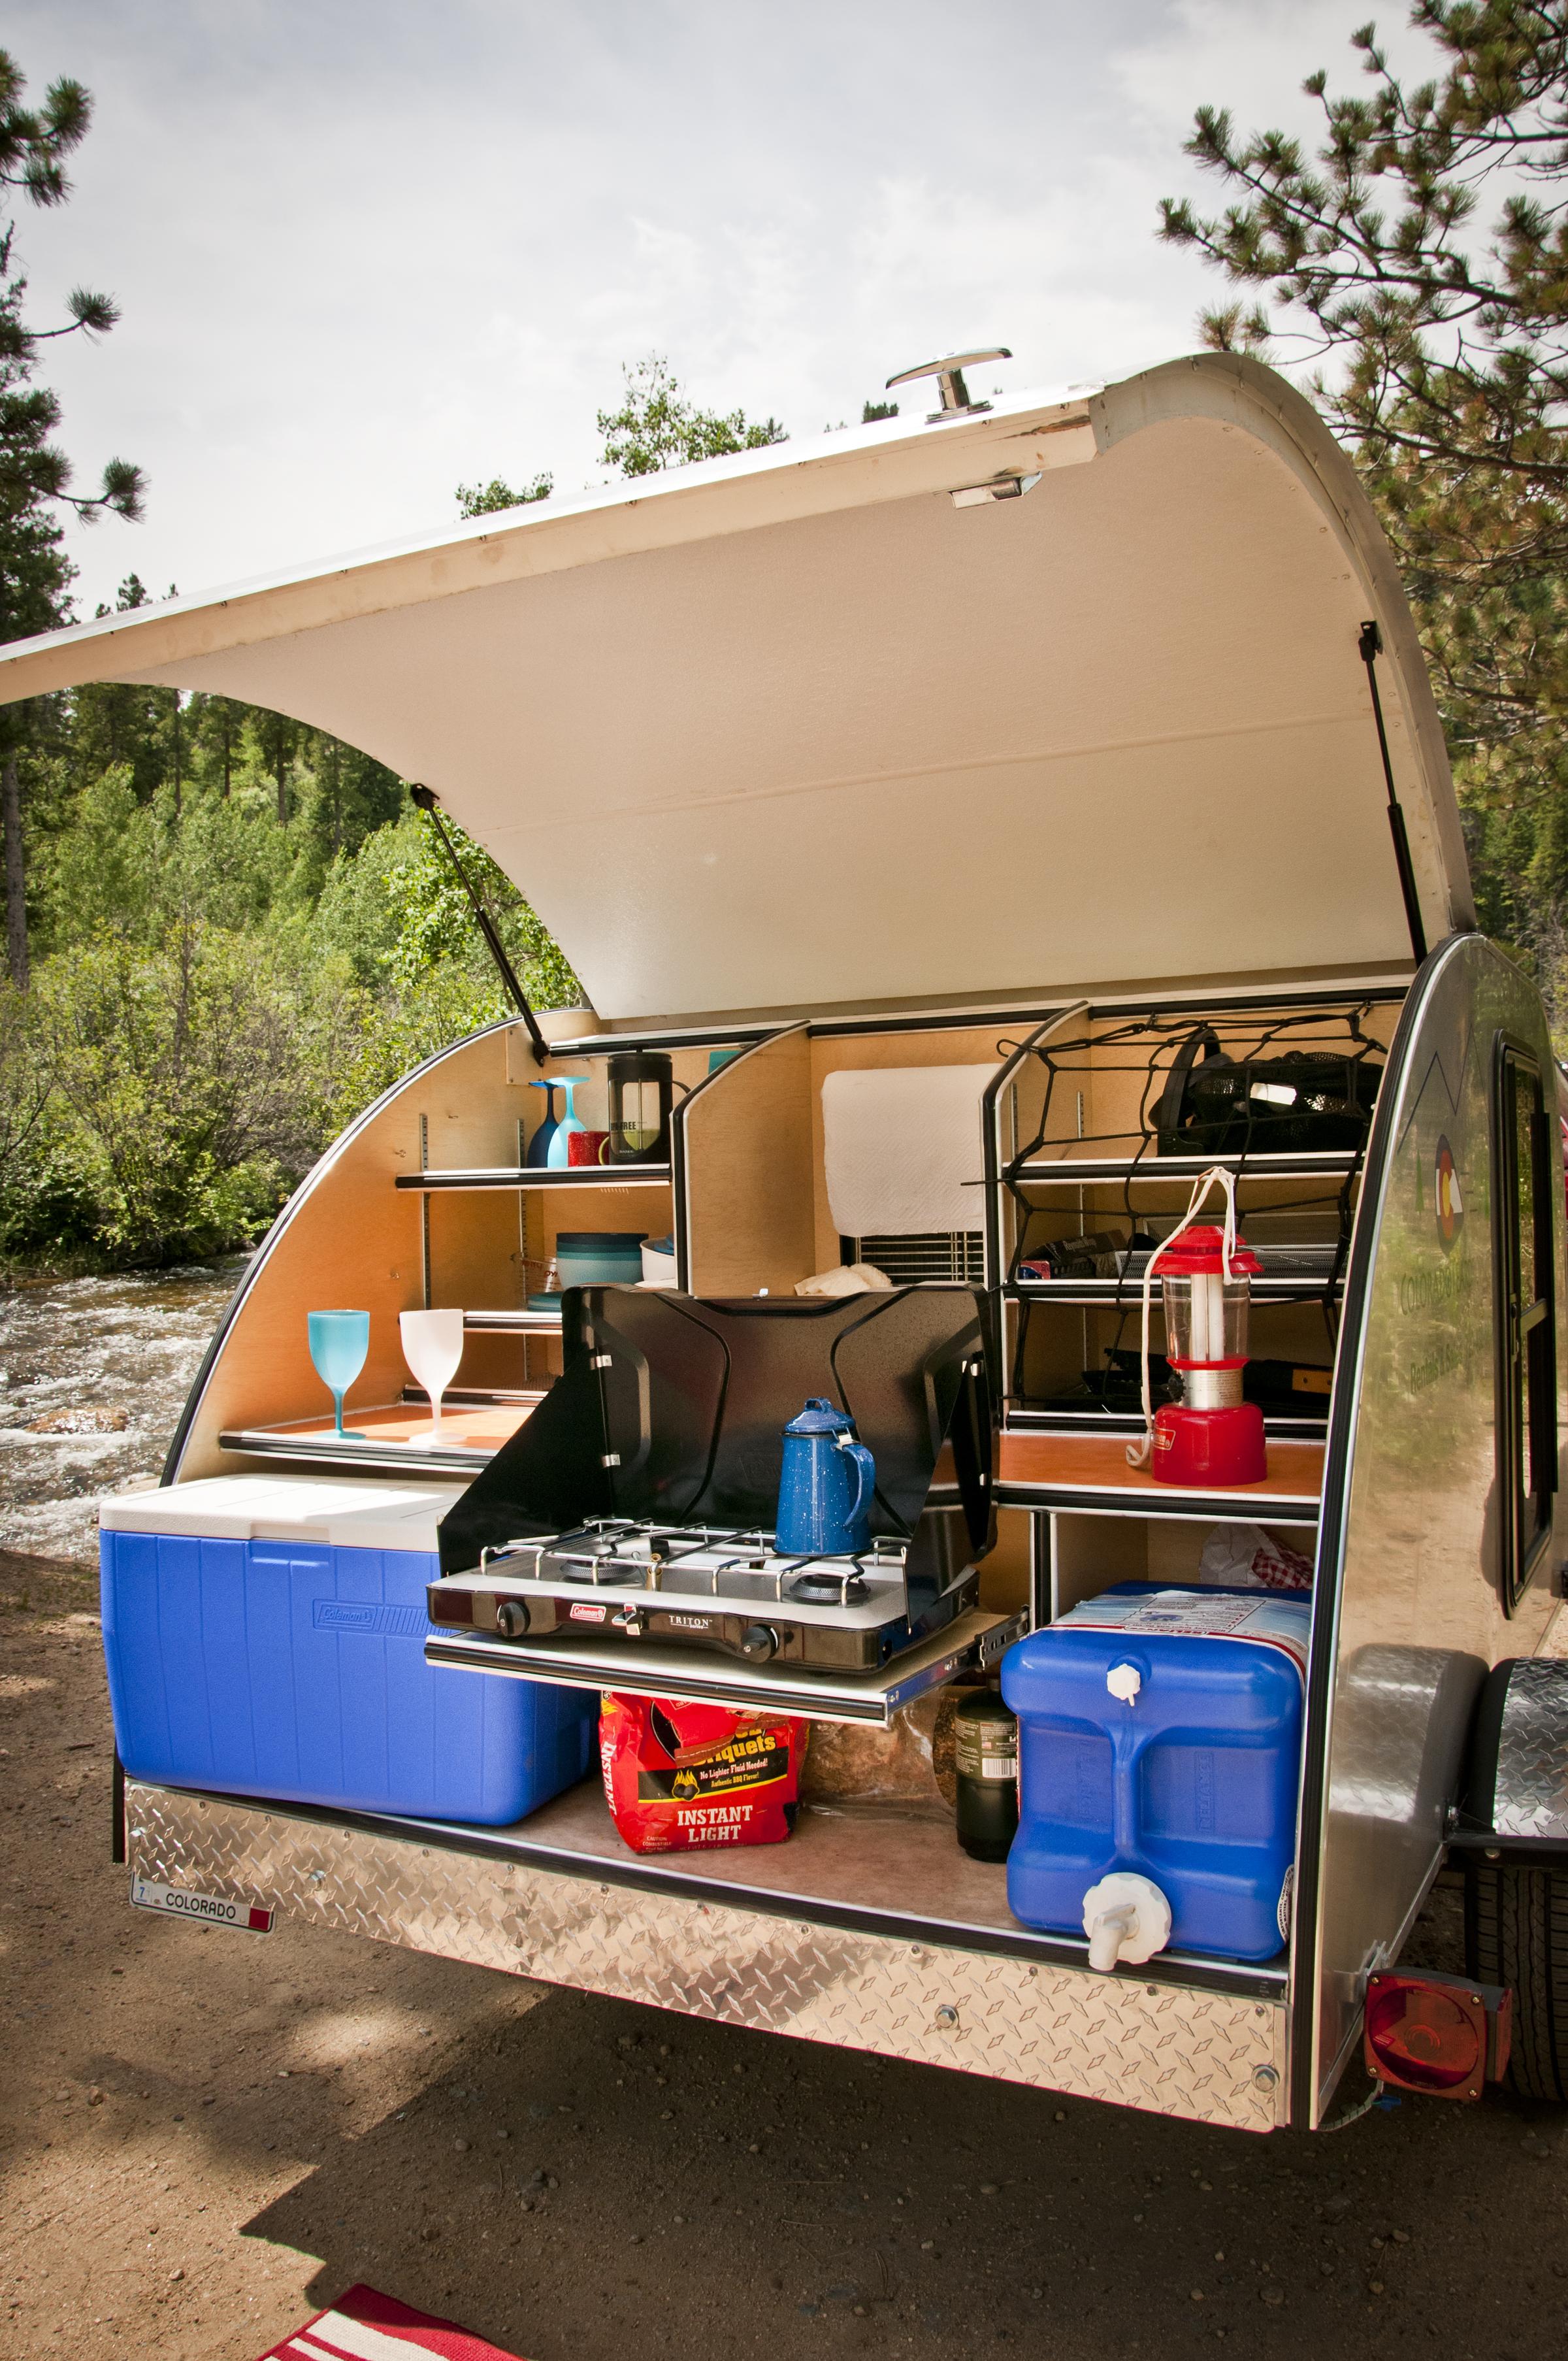 Basedrop colorado teardrops for Teardrop camper kitchen ideas